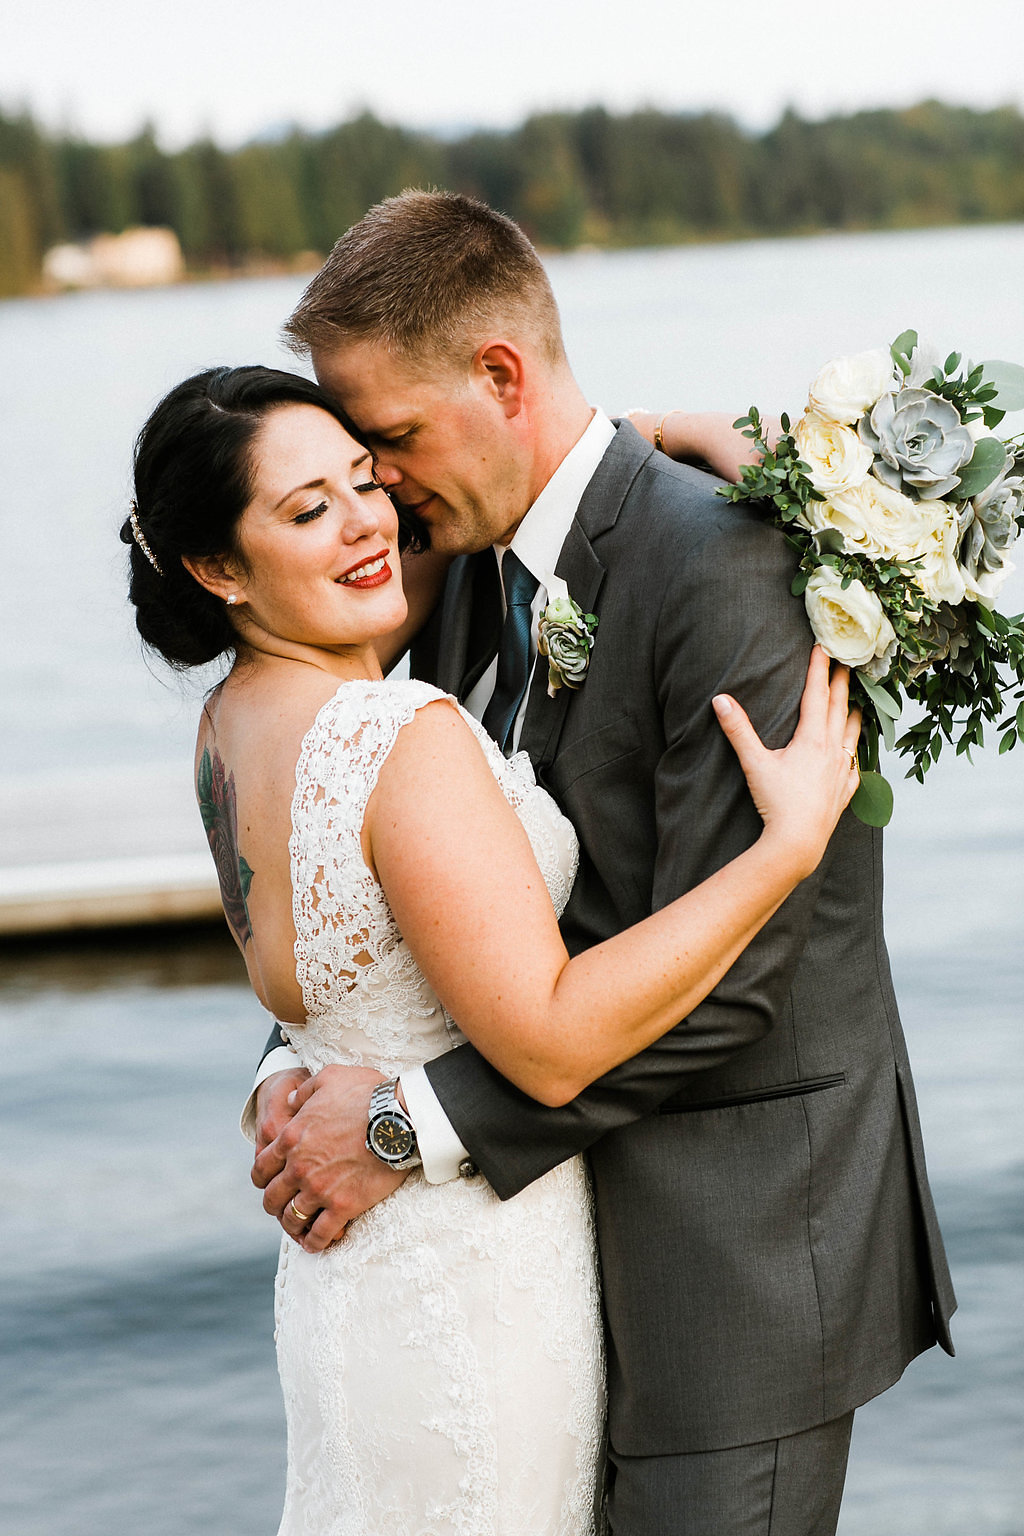 The_Green_Gates_at_Flowing_Lake_Wedding_Alissa+Dan_by_Adina_Preston_Weddings_1227.JPG